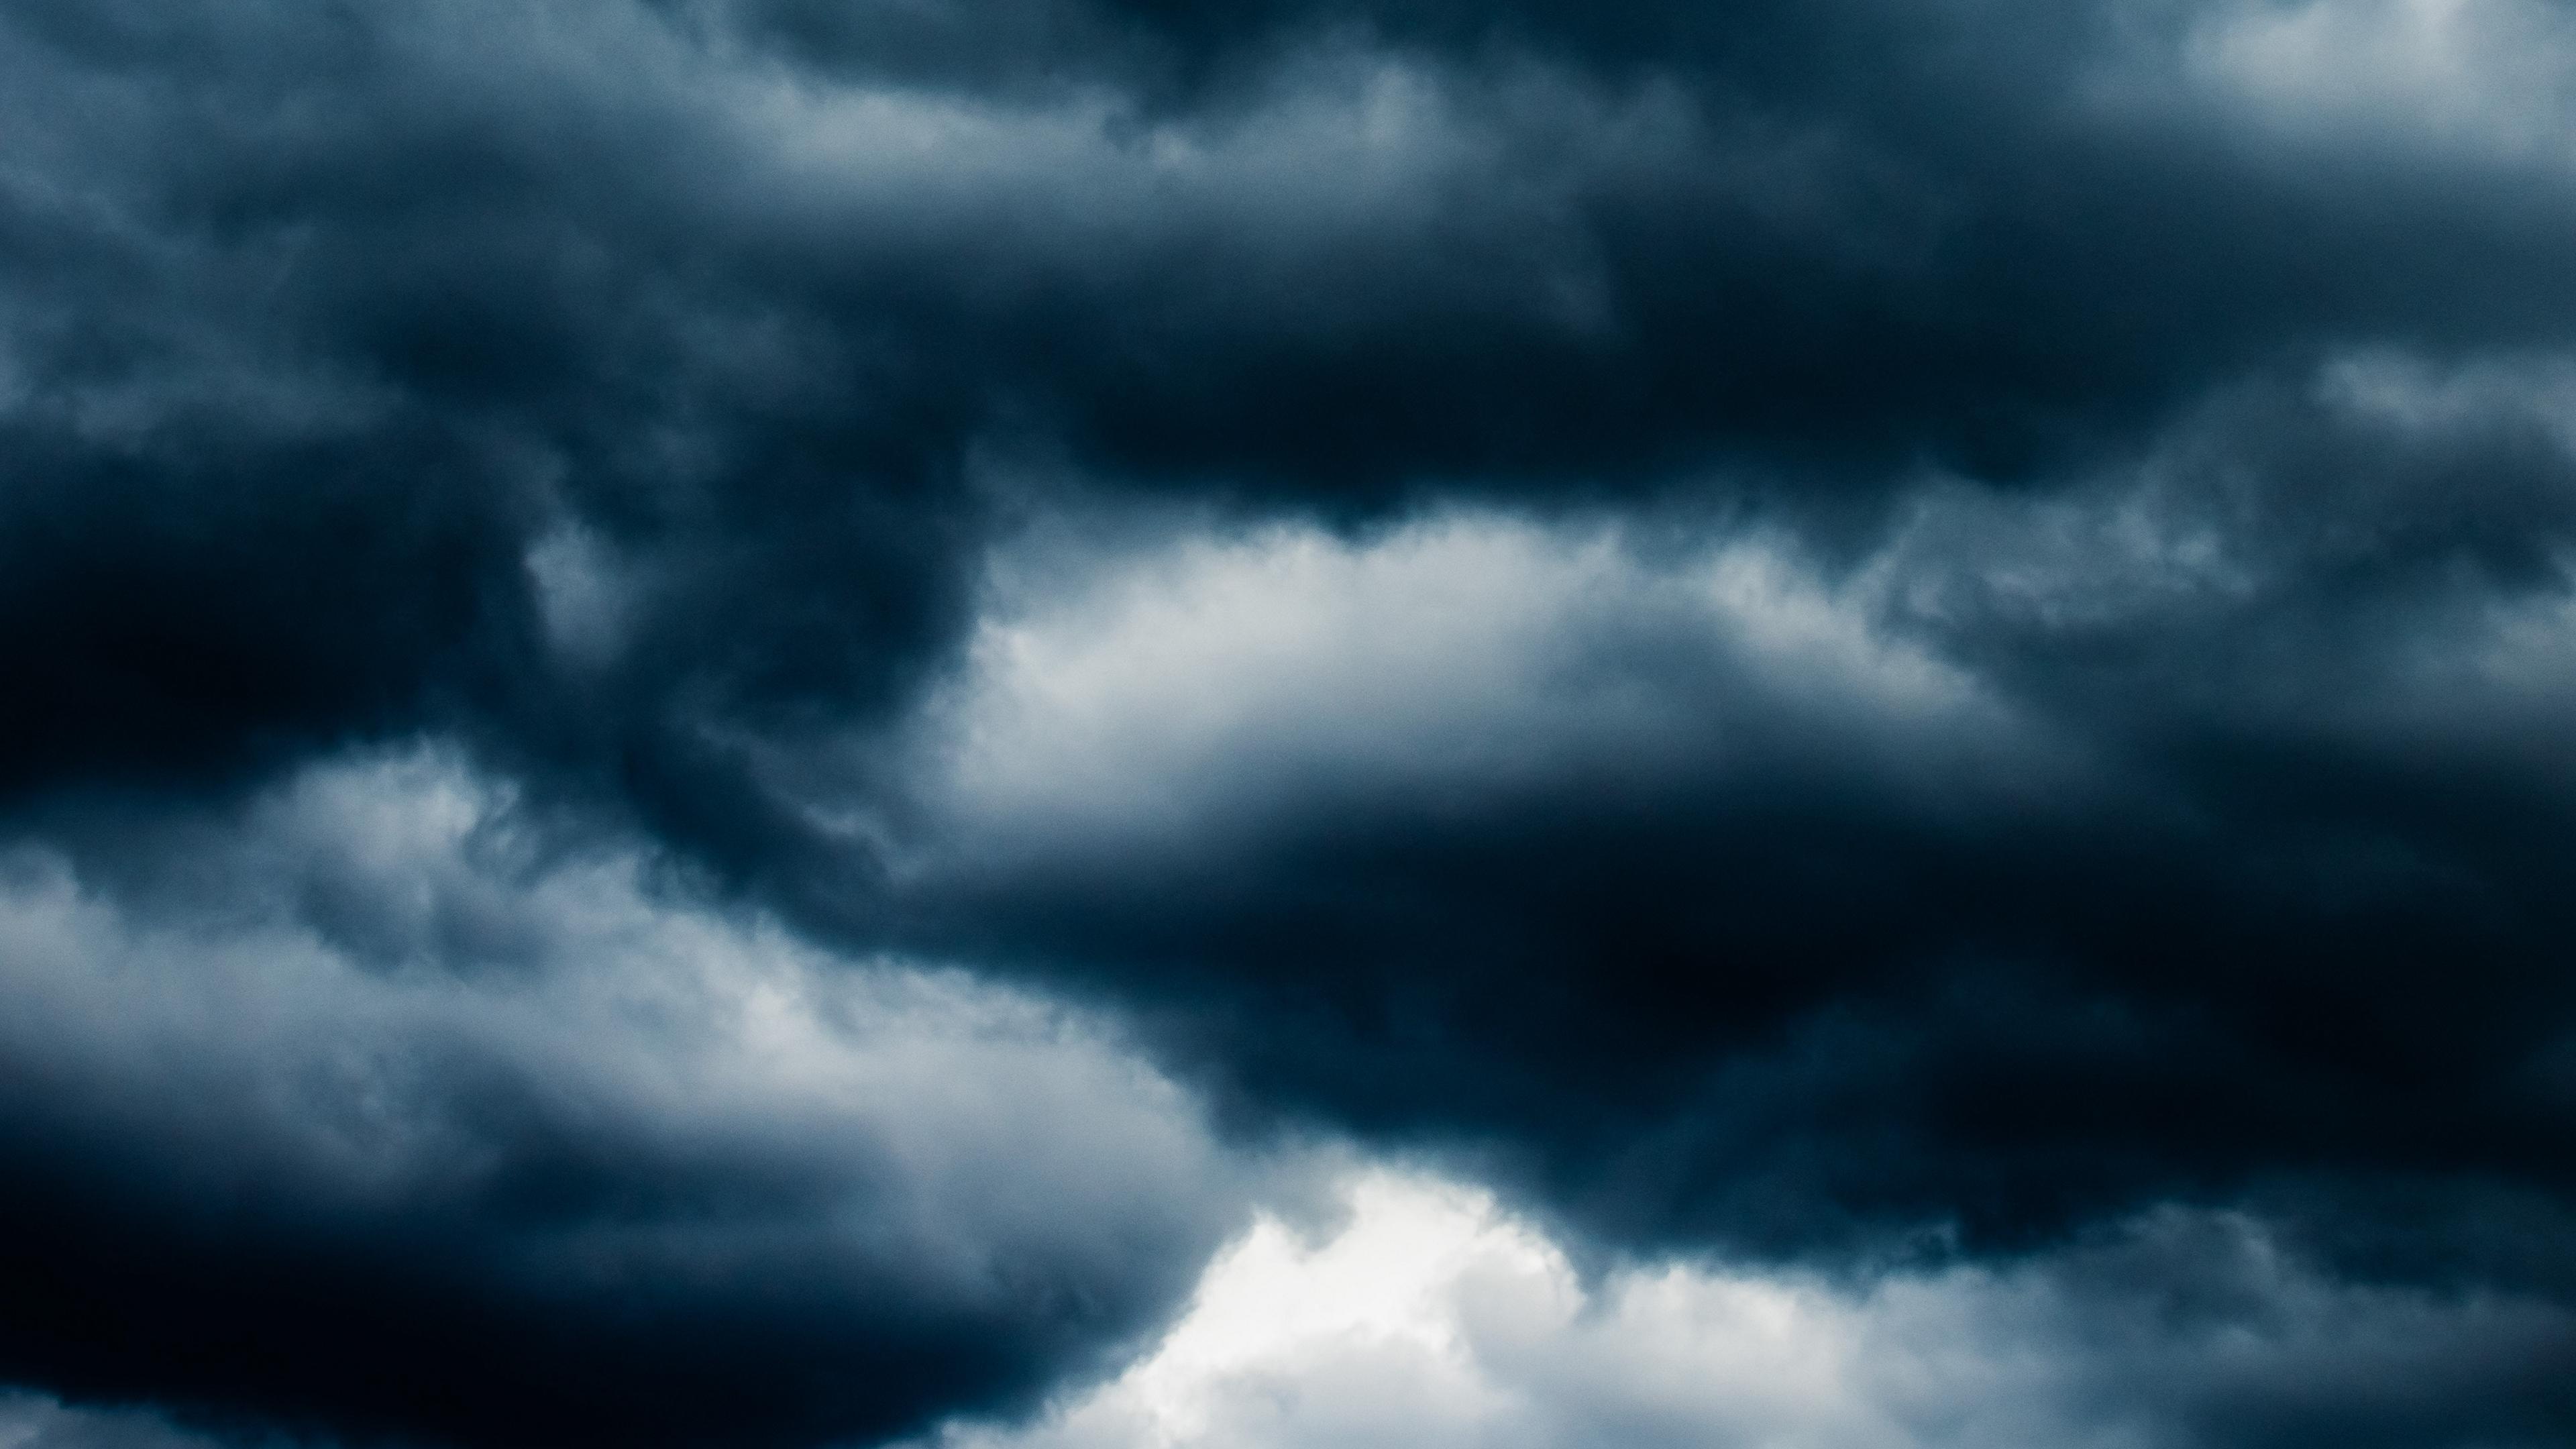 clouds sky dark porous cloudy 4k 1541113514 - clouds, sky, dark, porous, cloudy 4k - Sky, Dark, Clouds